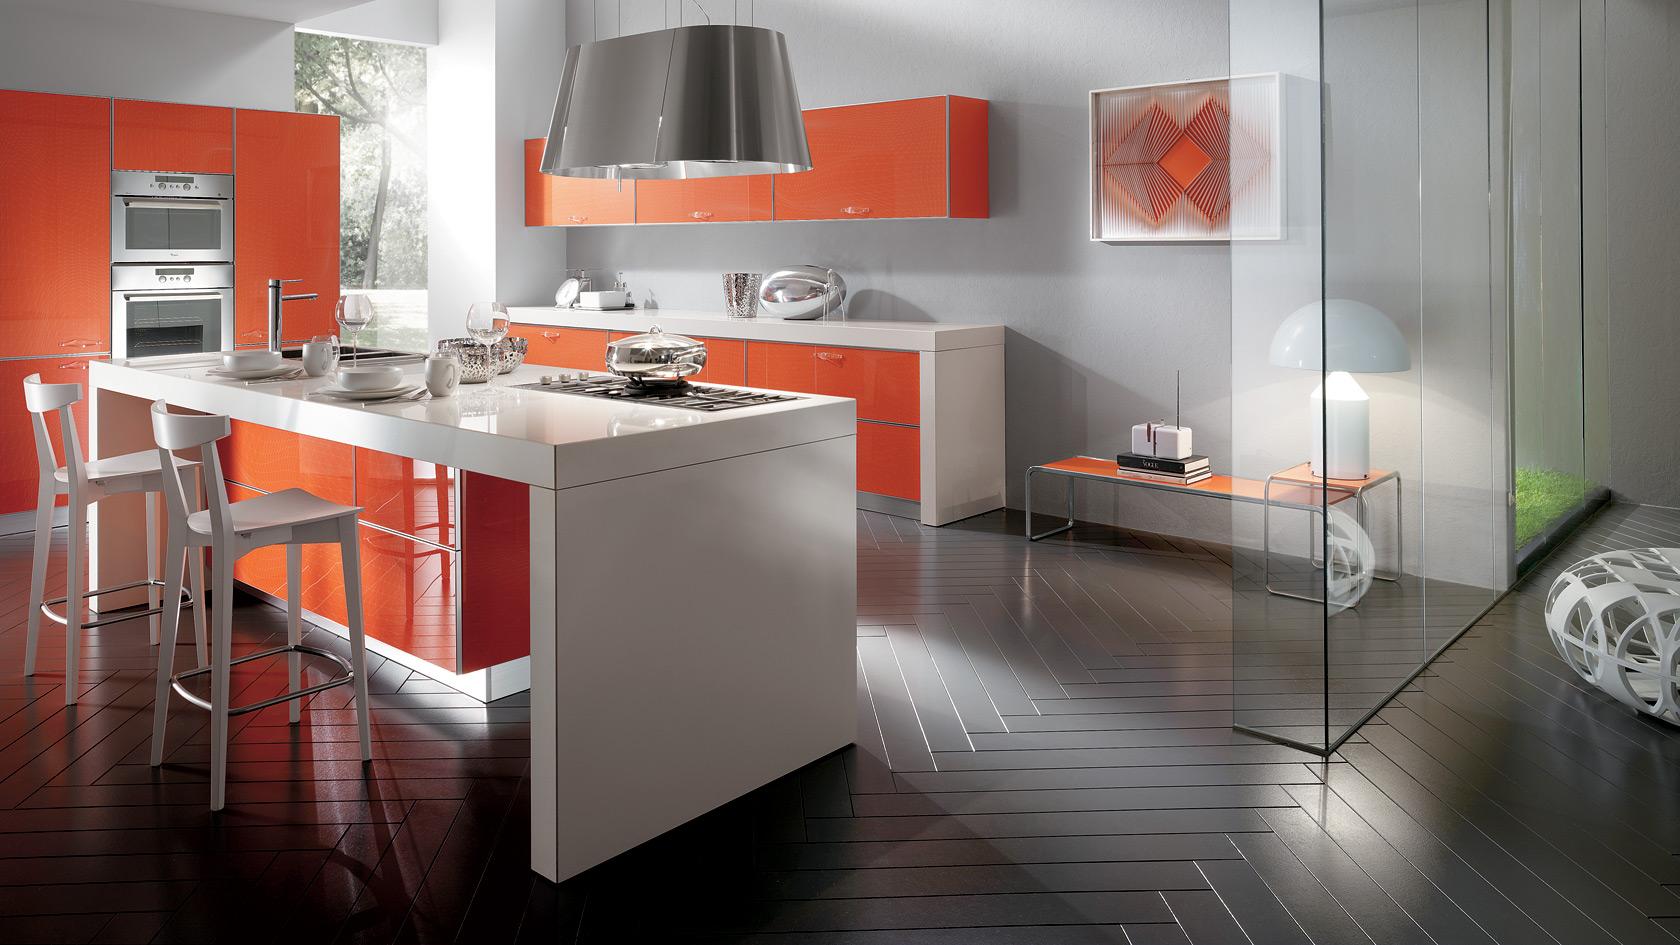 cucina-scavolini-crystal-arredamenti-modena-3 - Arredamenti Casarini ...